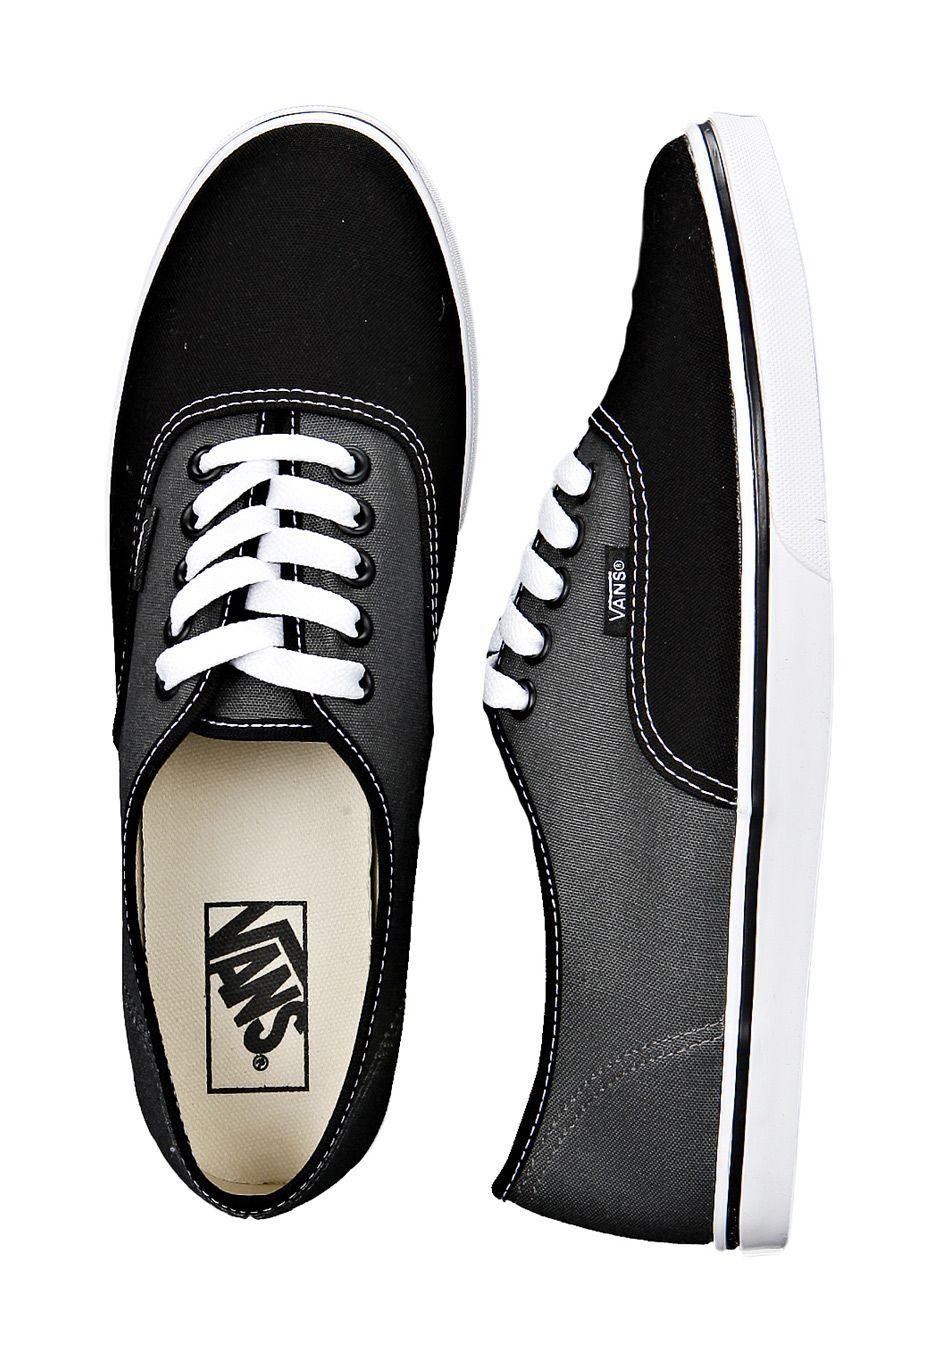 Black and dark gray vans for women | Zapatos impresionantes